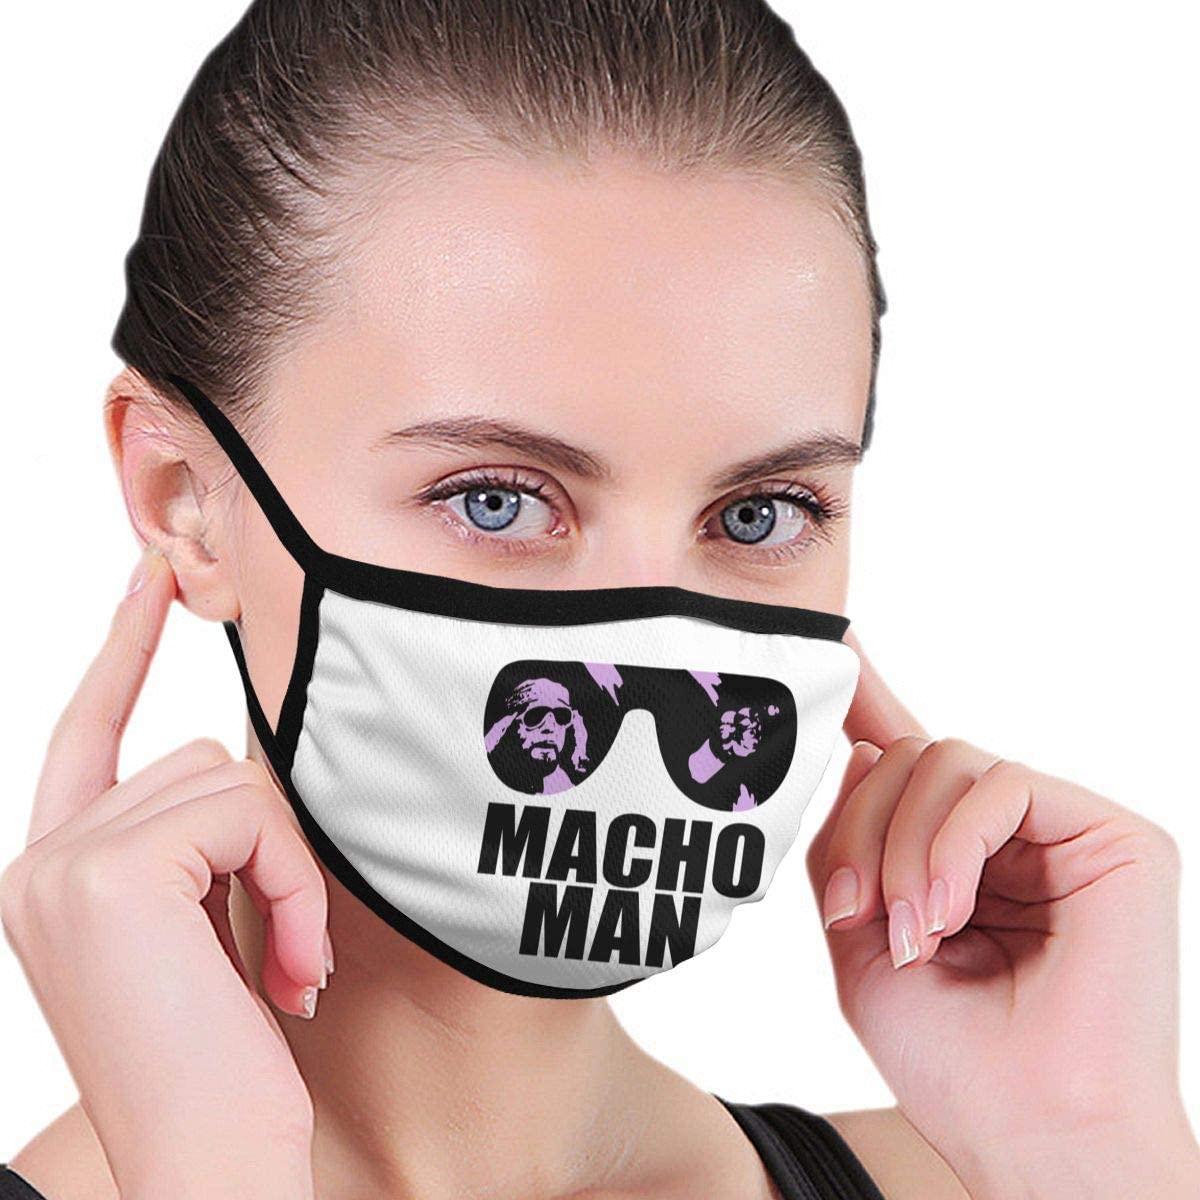 Qwtykeertyi Macho Man Fashion Protective Reusable Unisex Black Cotton Washable Balaclava